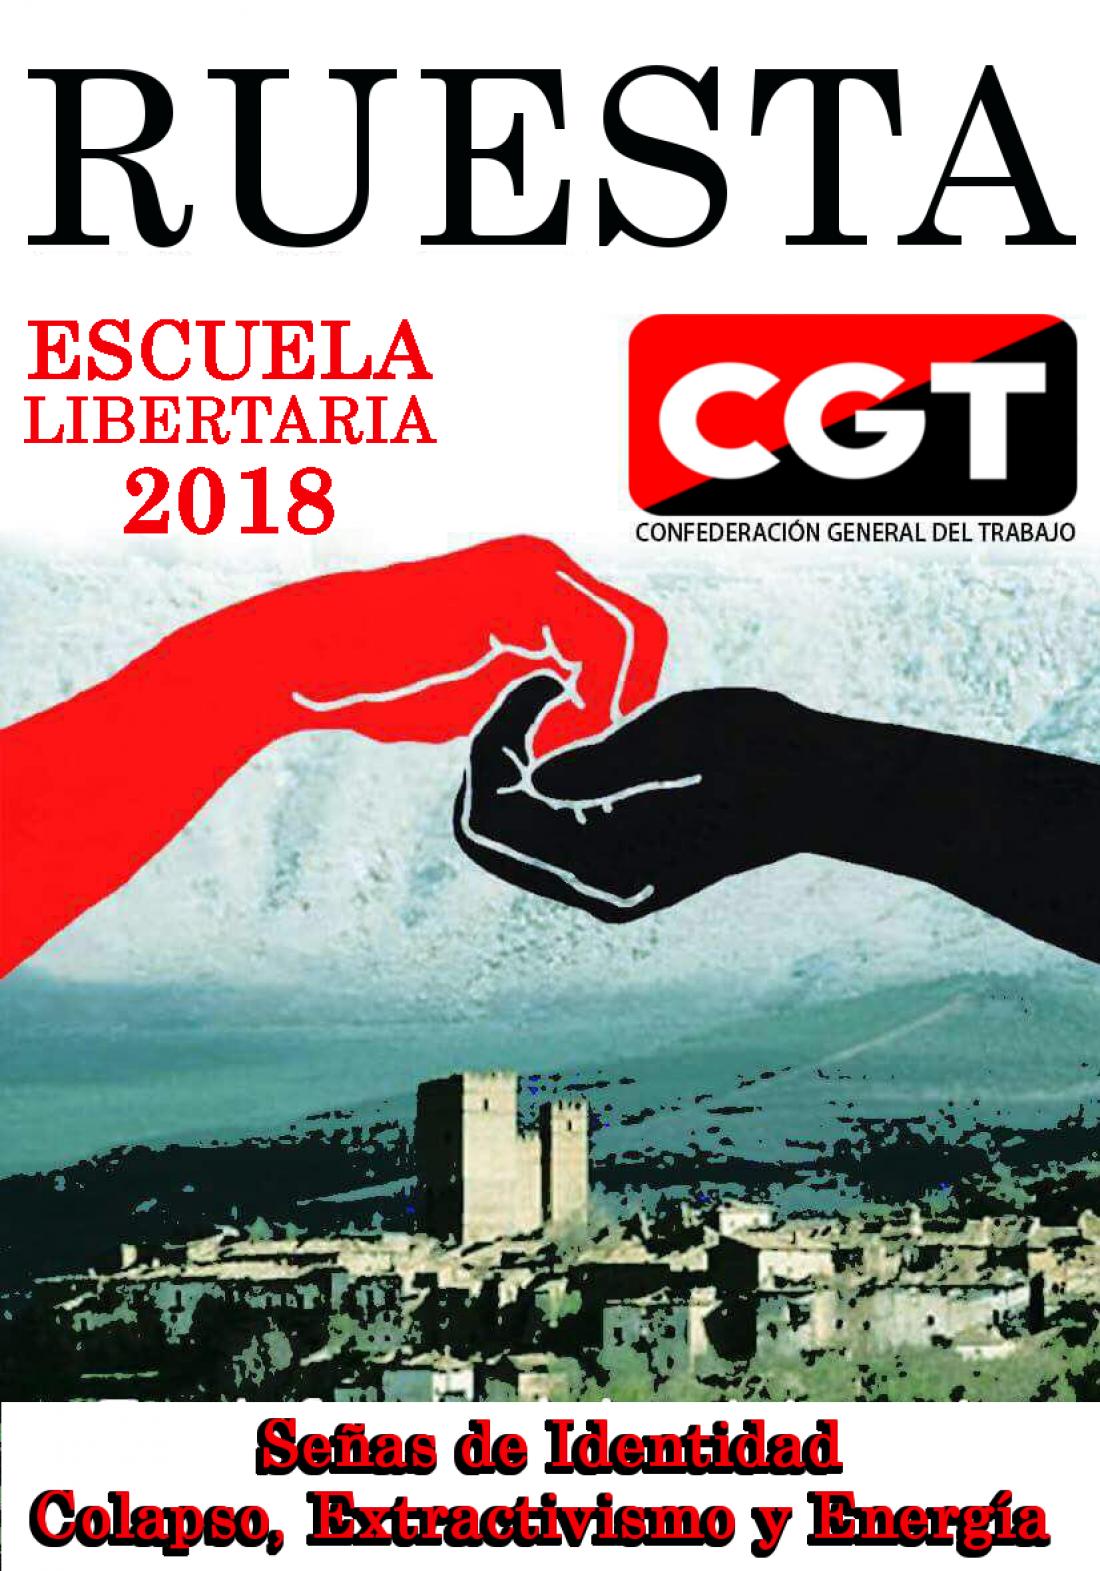 Escuela Libertaria Ruesta 2018